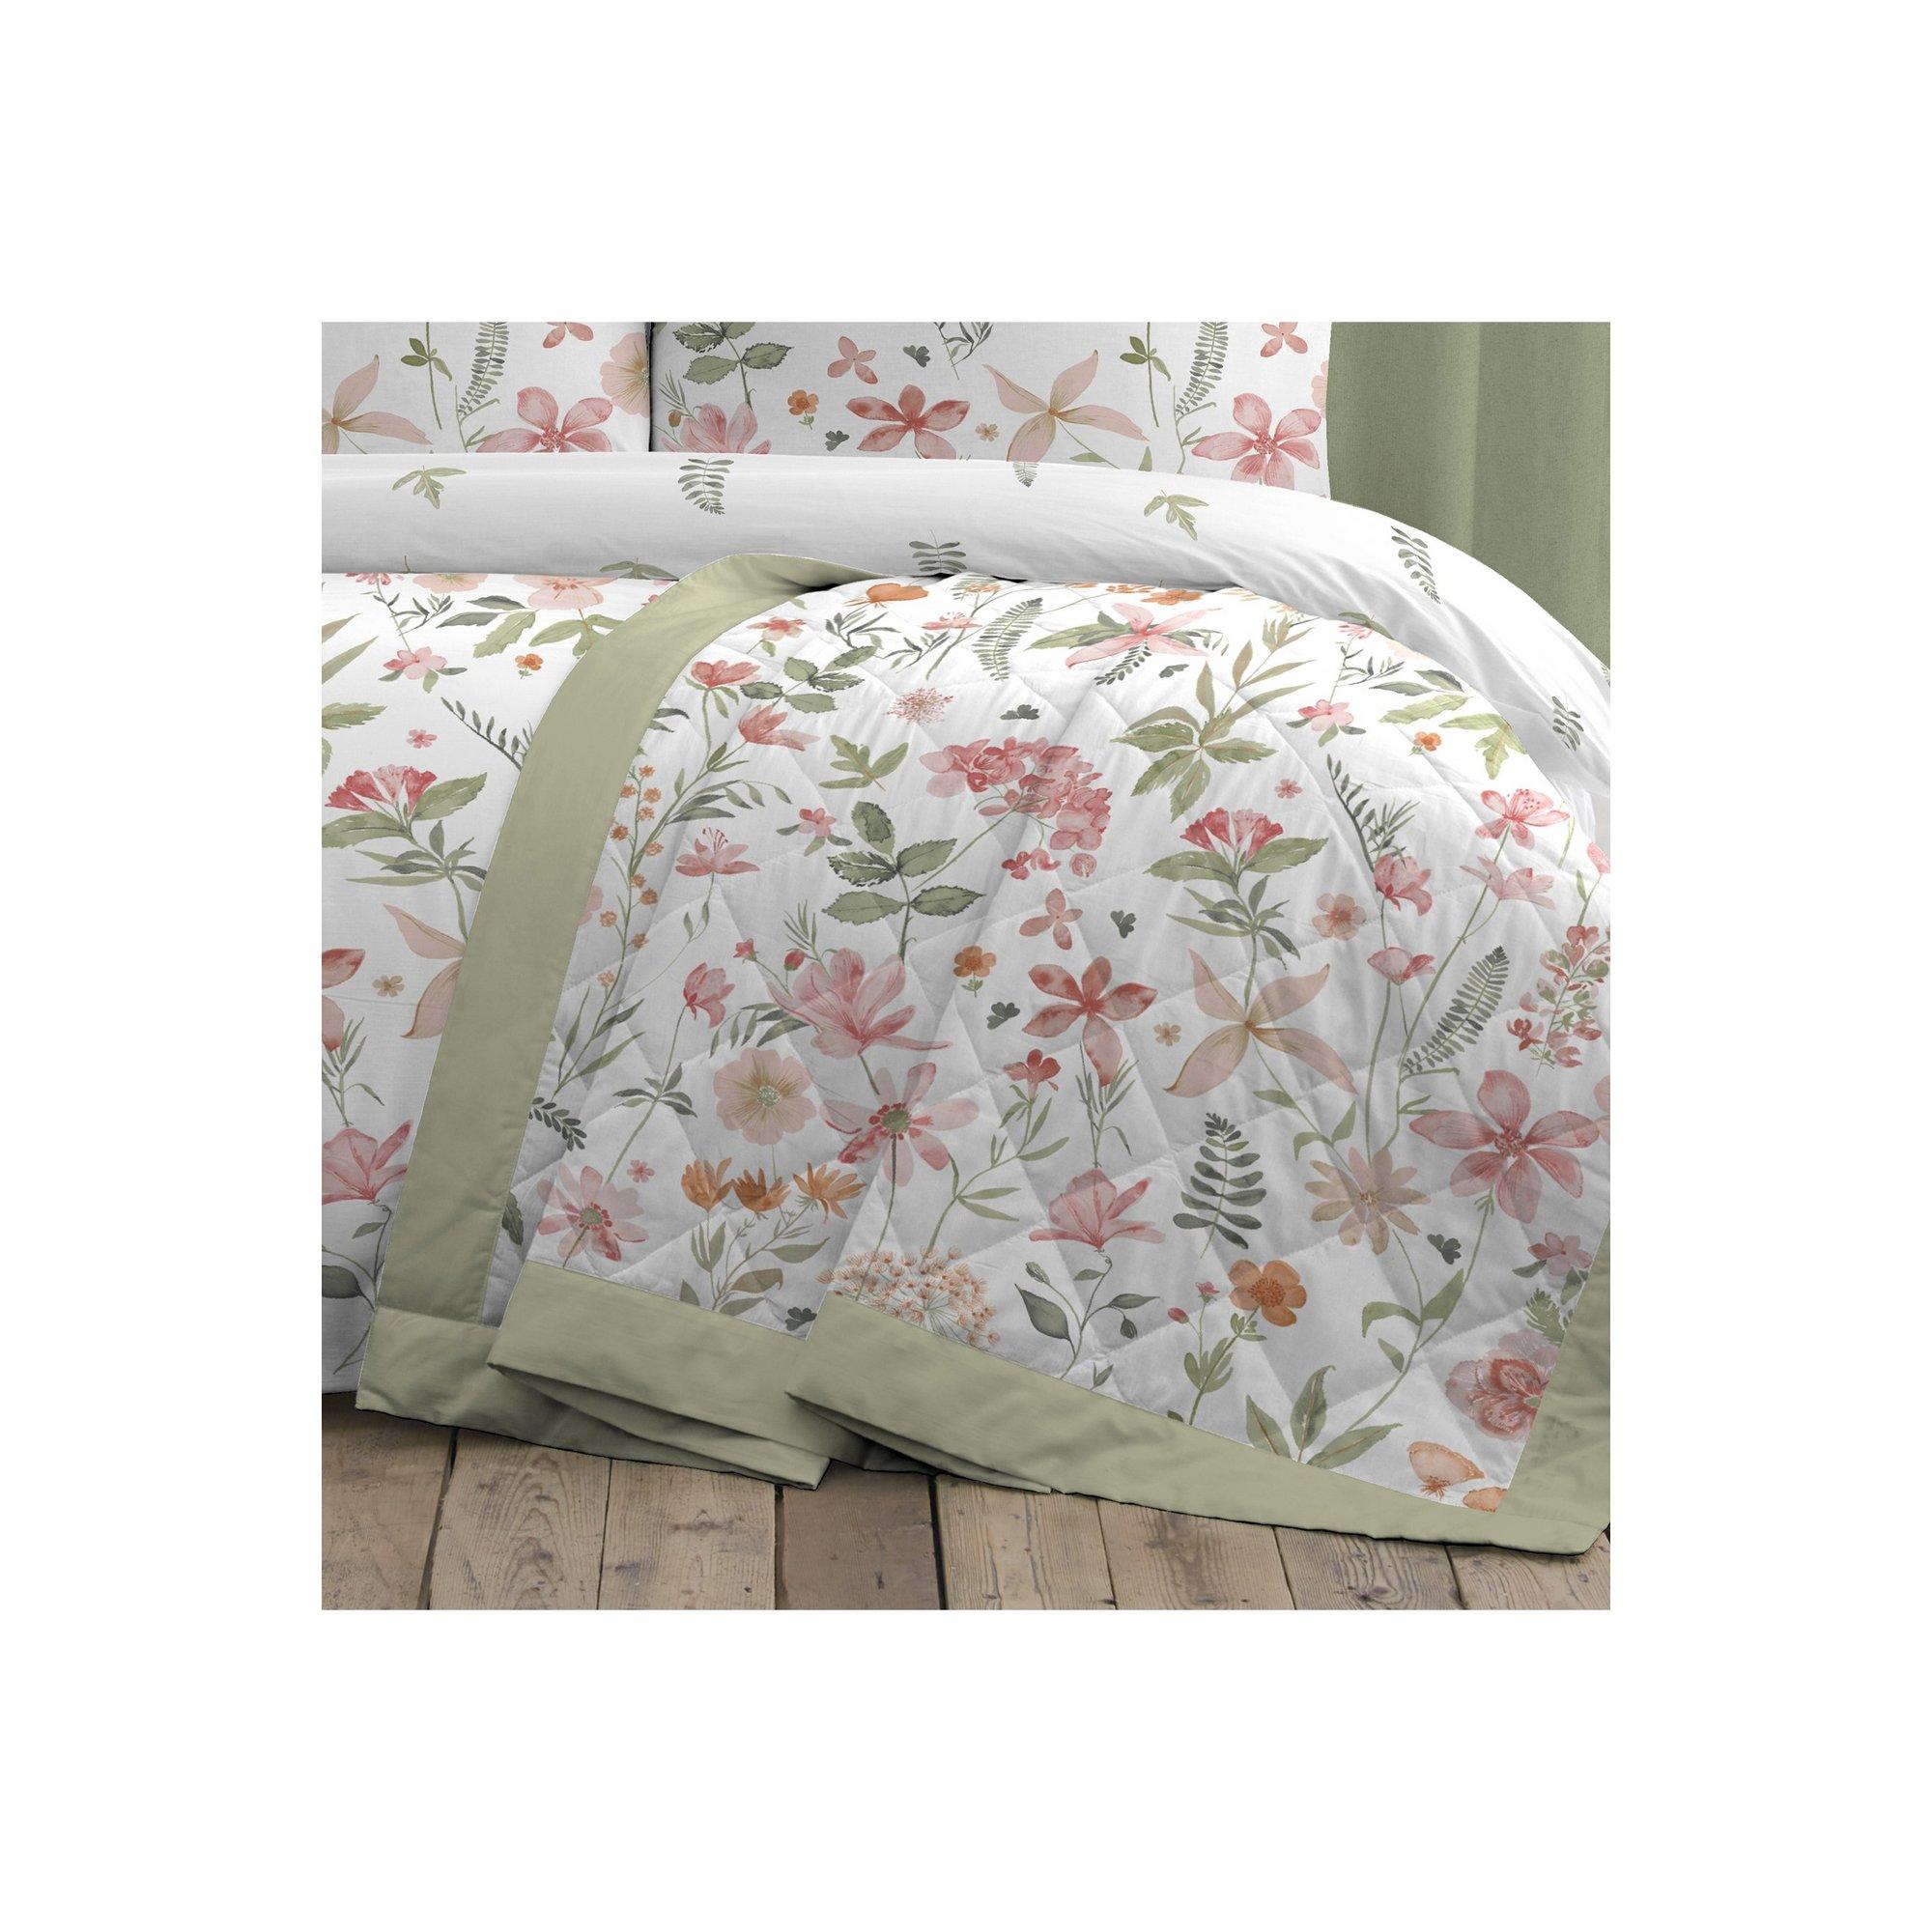 Image of Aimee Coral Bedspread